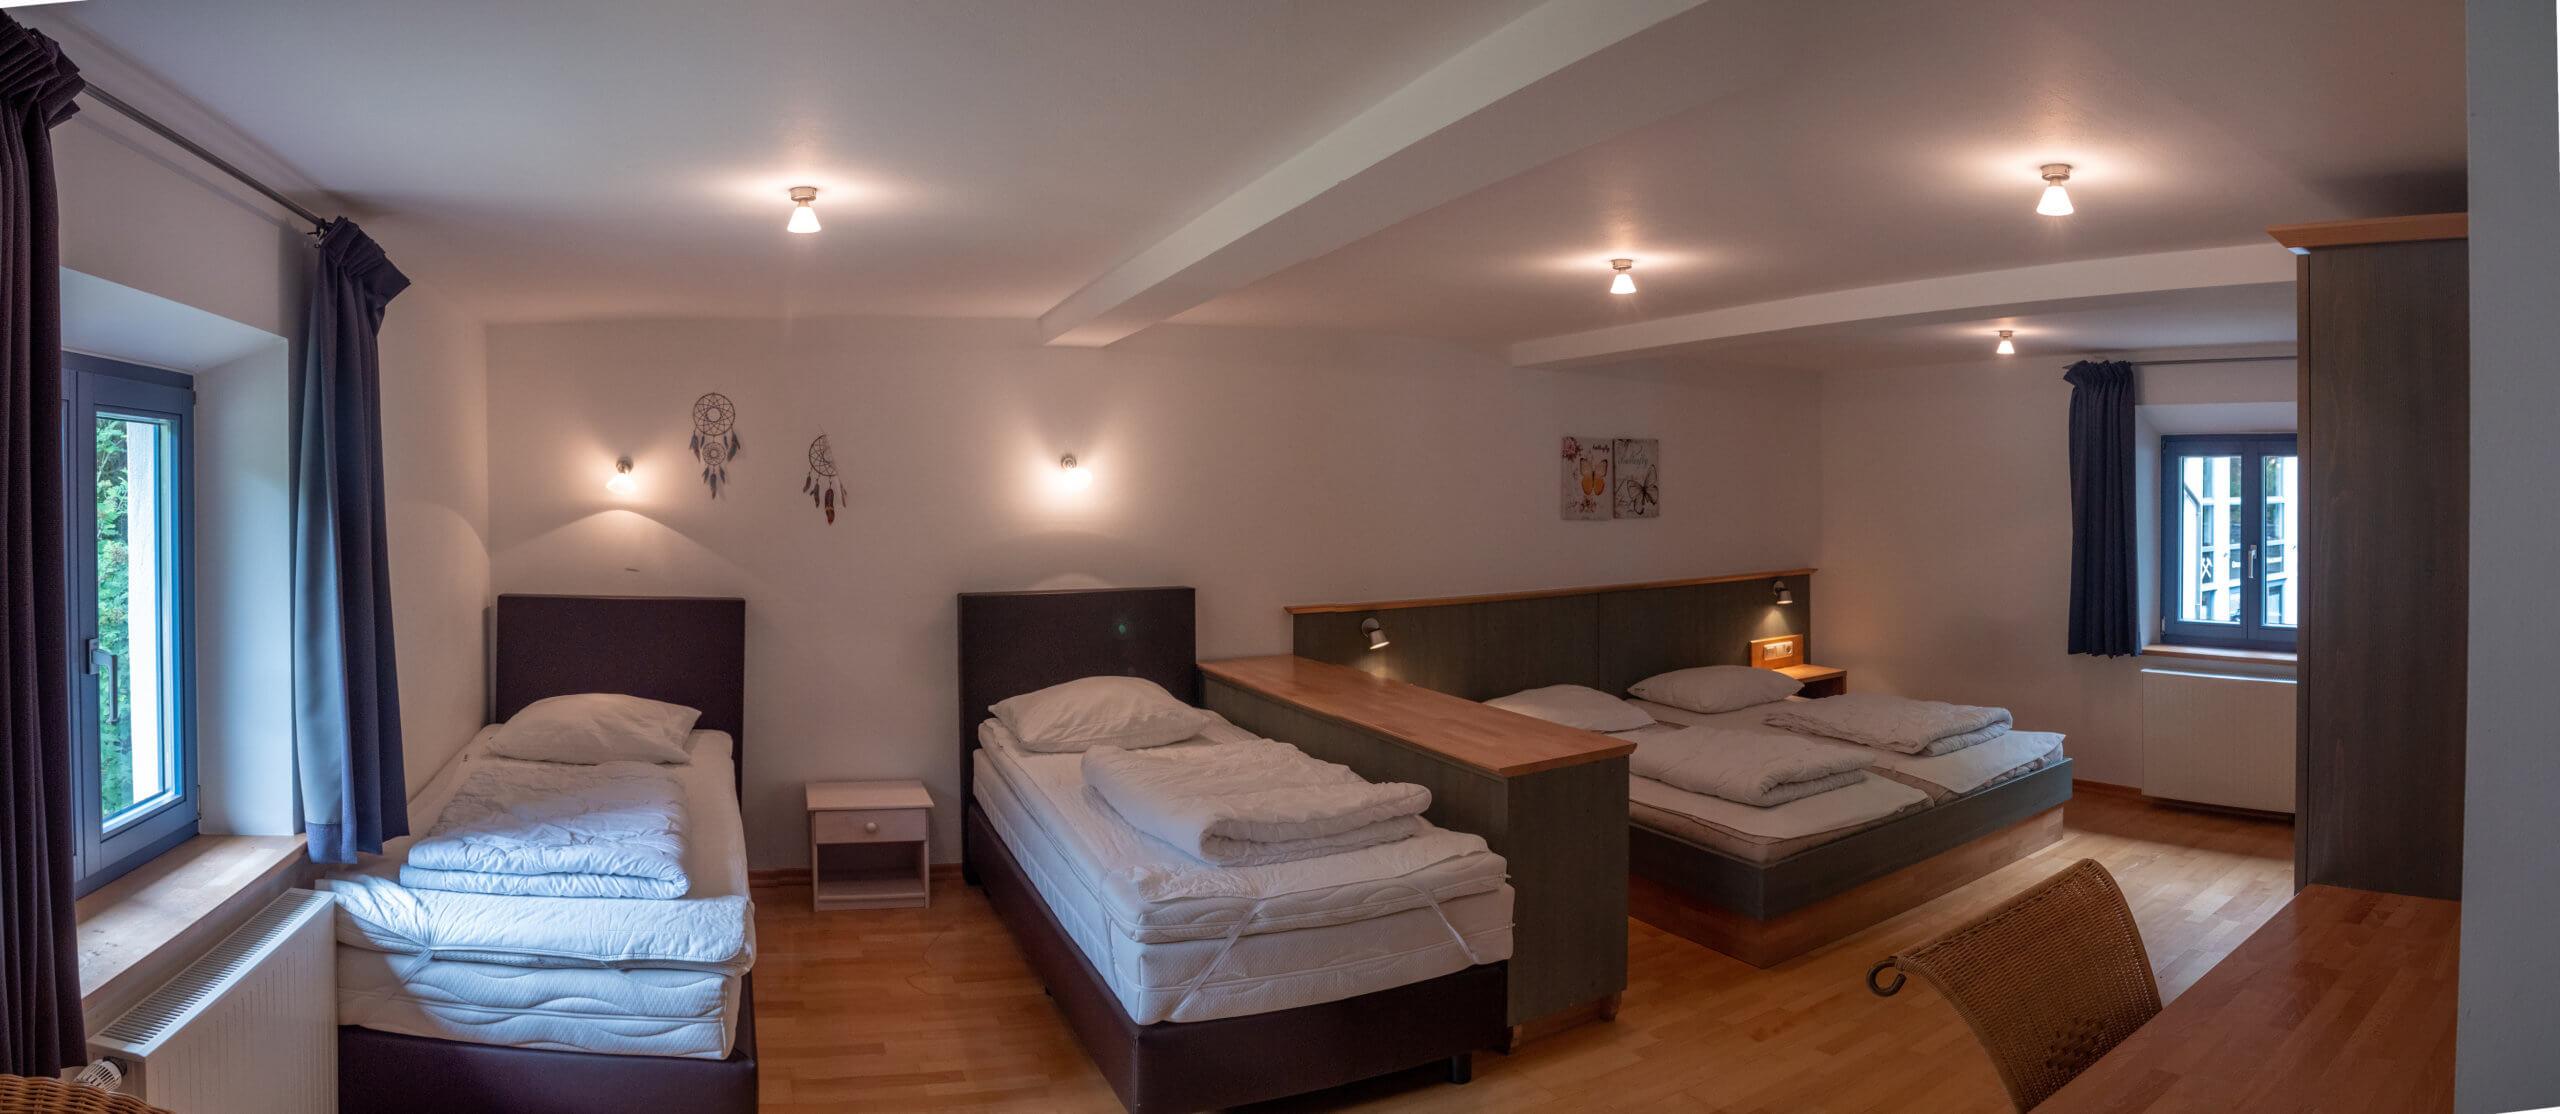 Innen - Schlafzimmer #1a - Pano